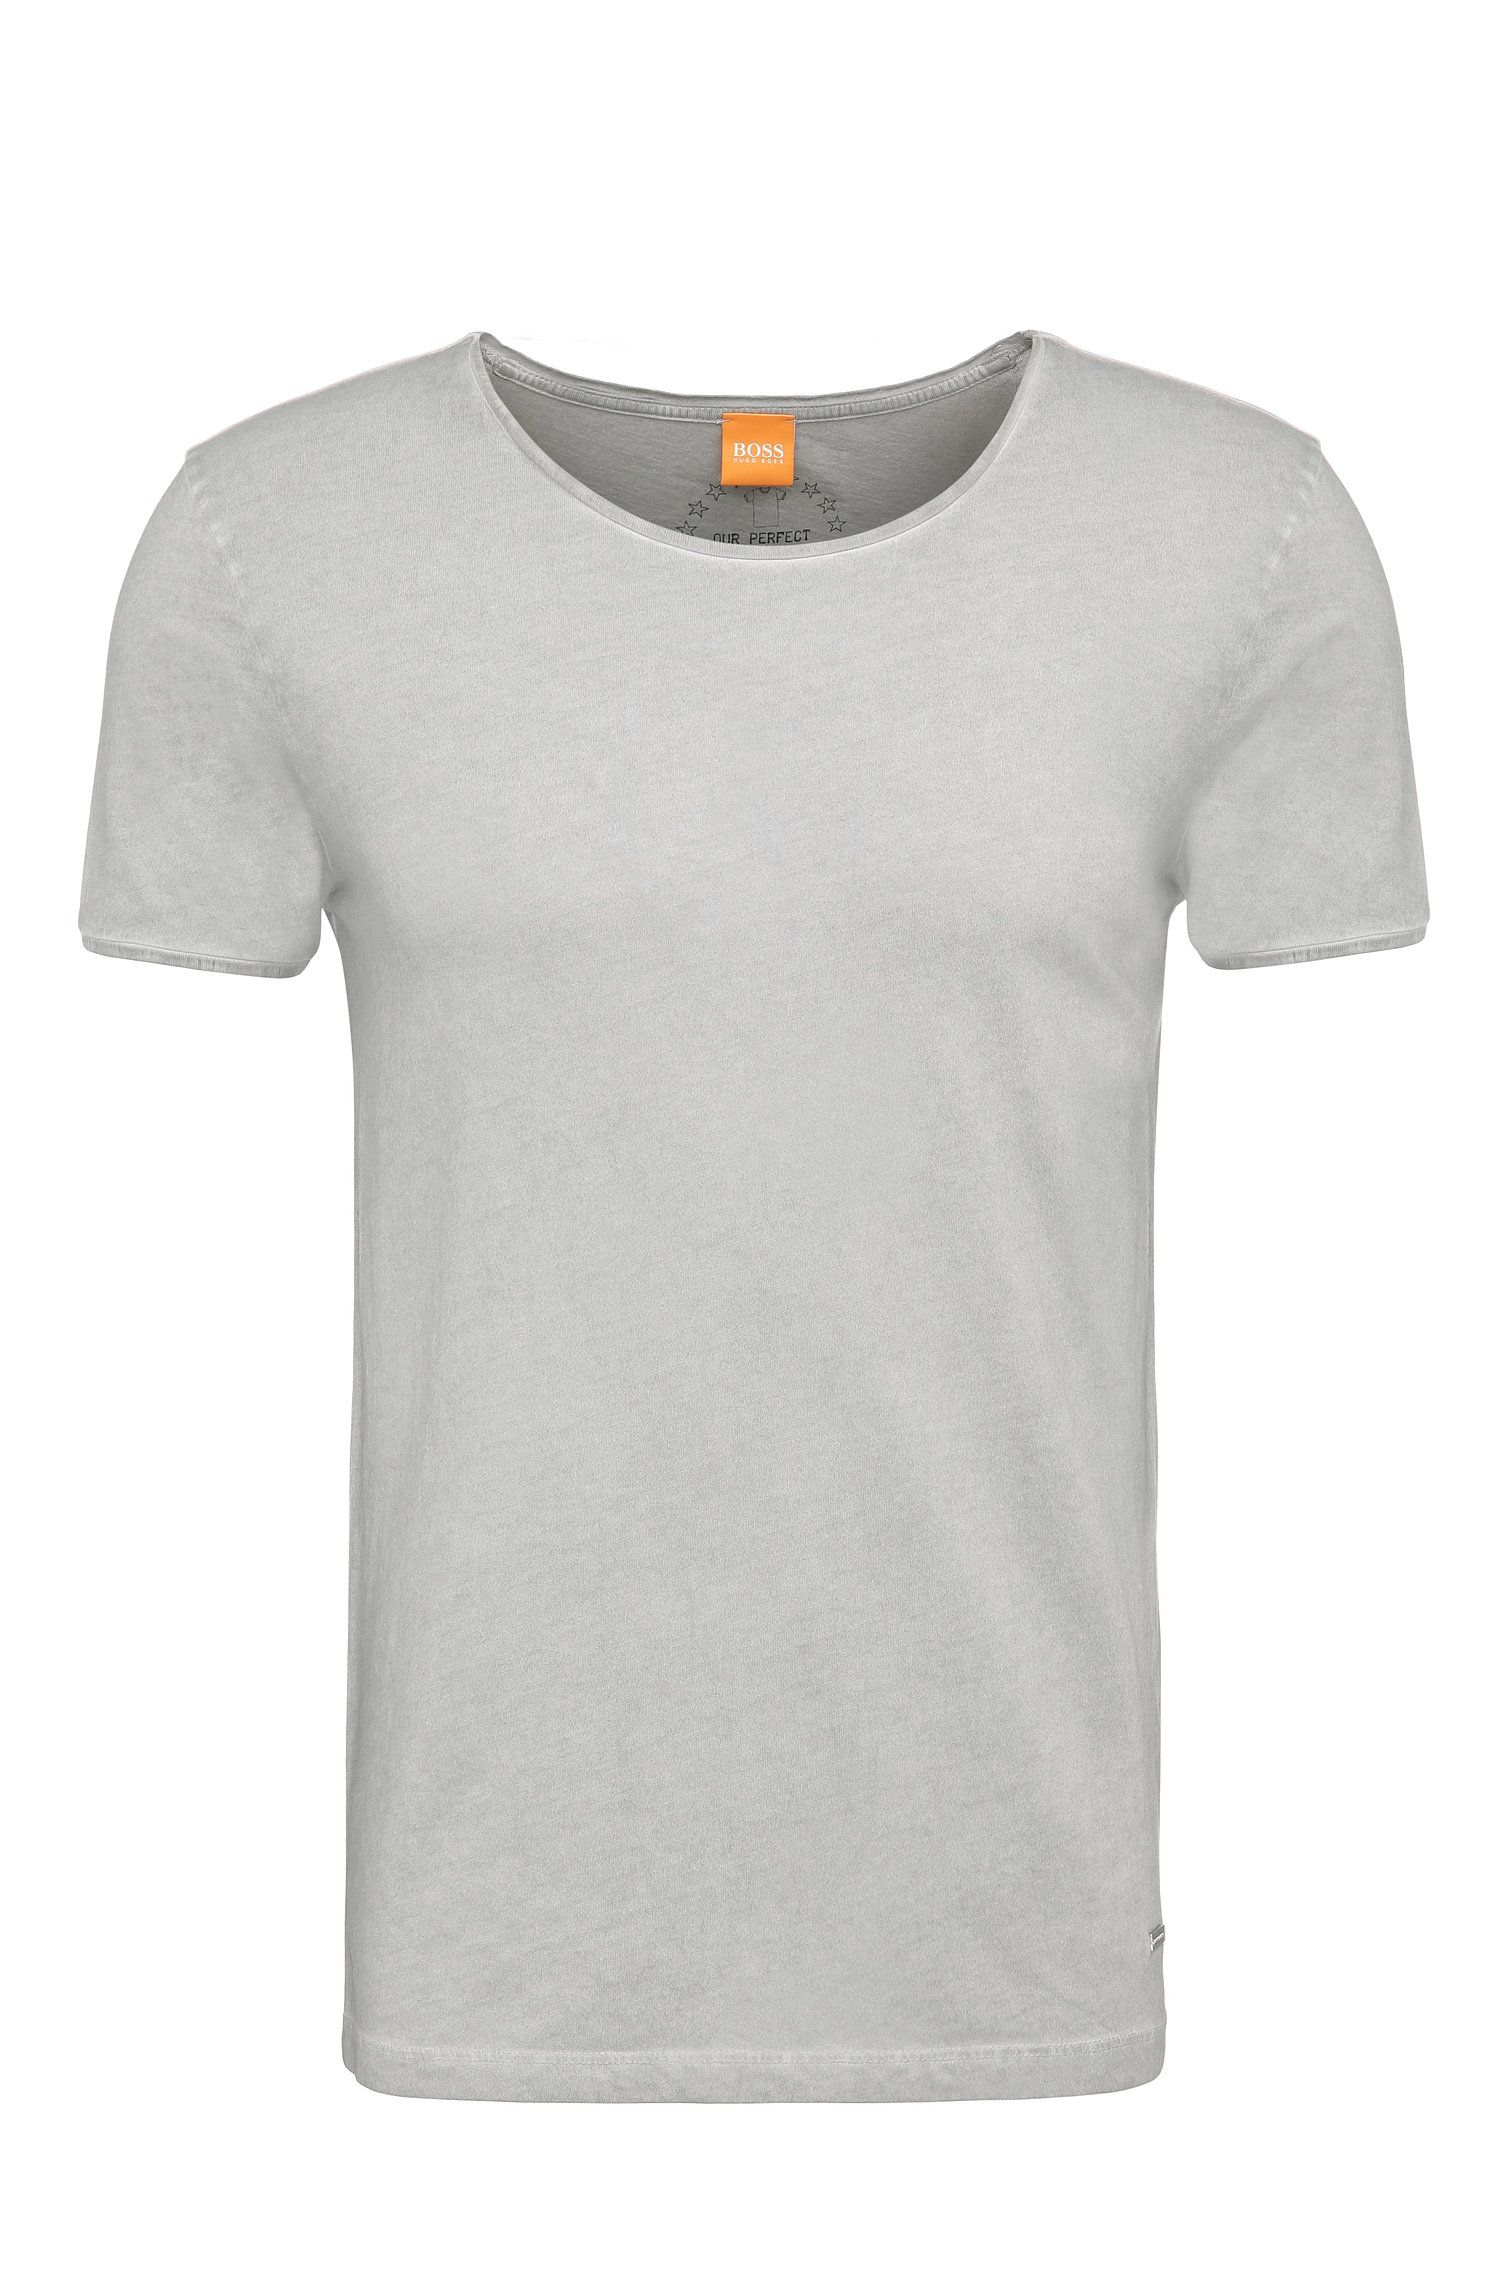 Plain slim-fit t-shirt in cotton: 'Touring'